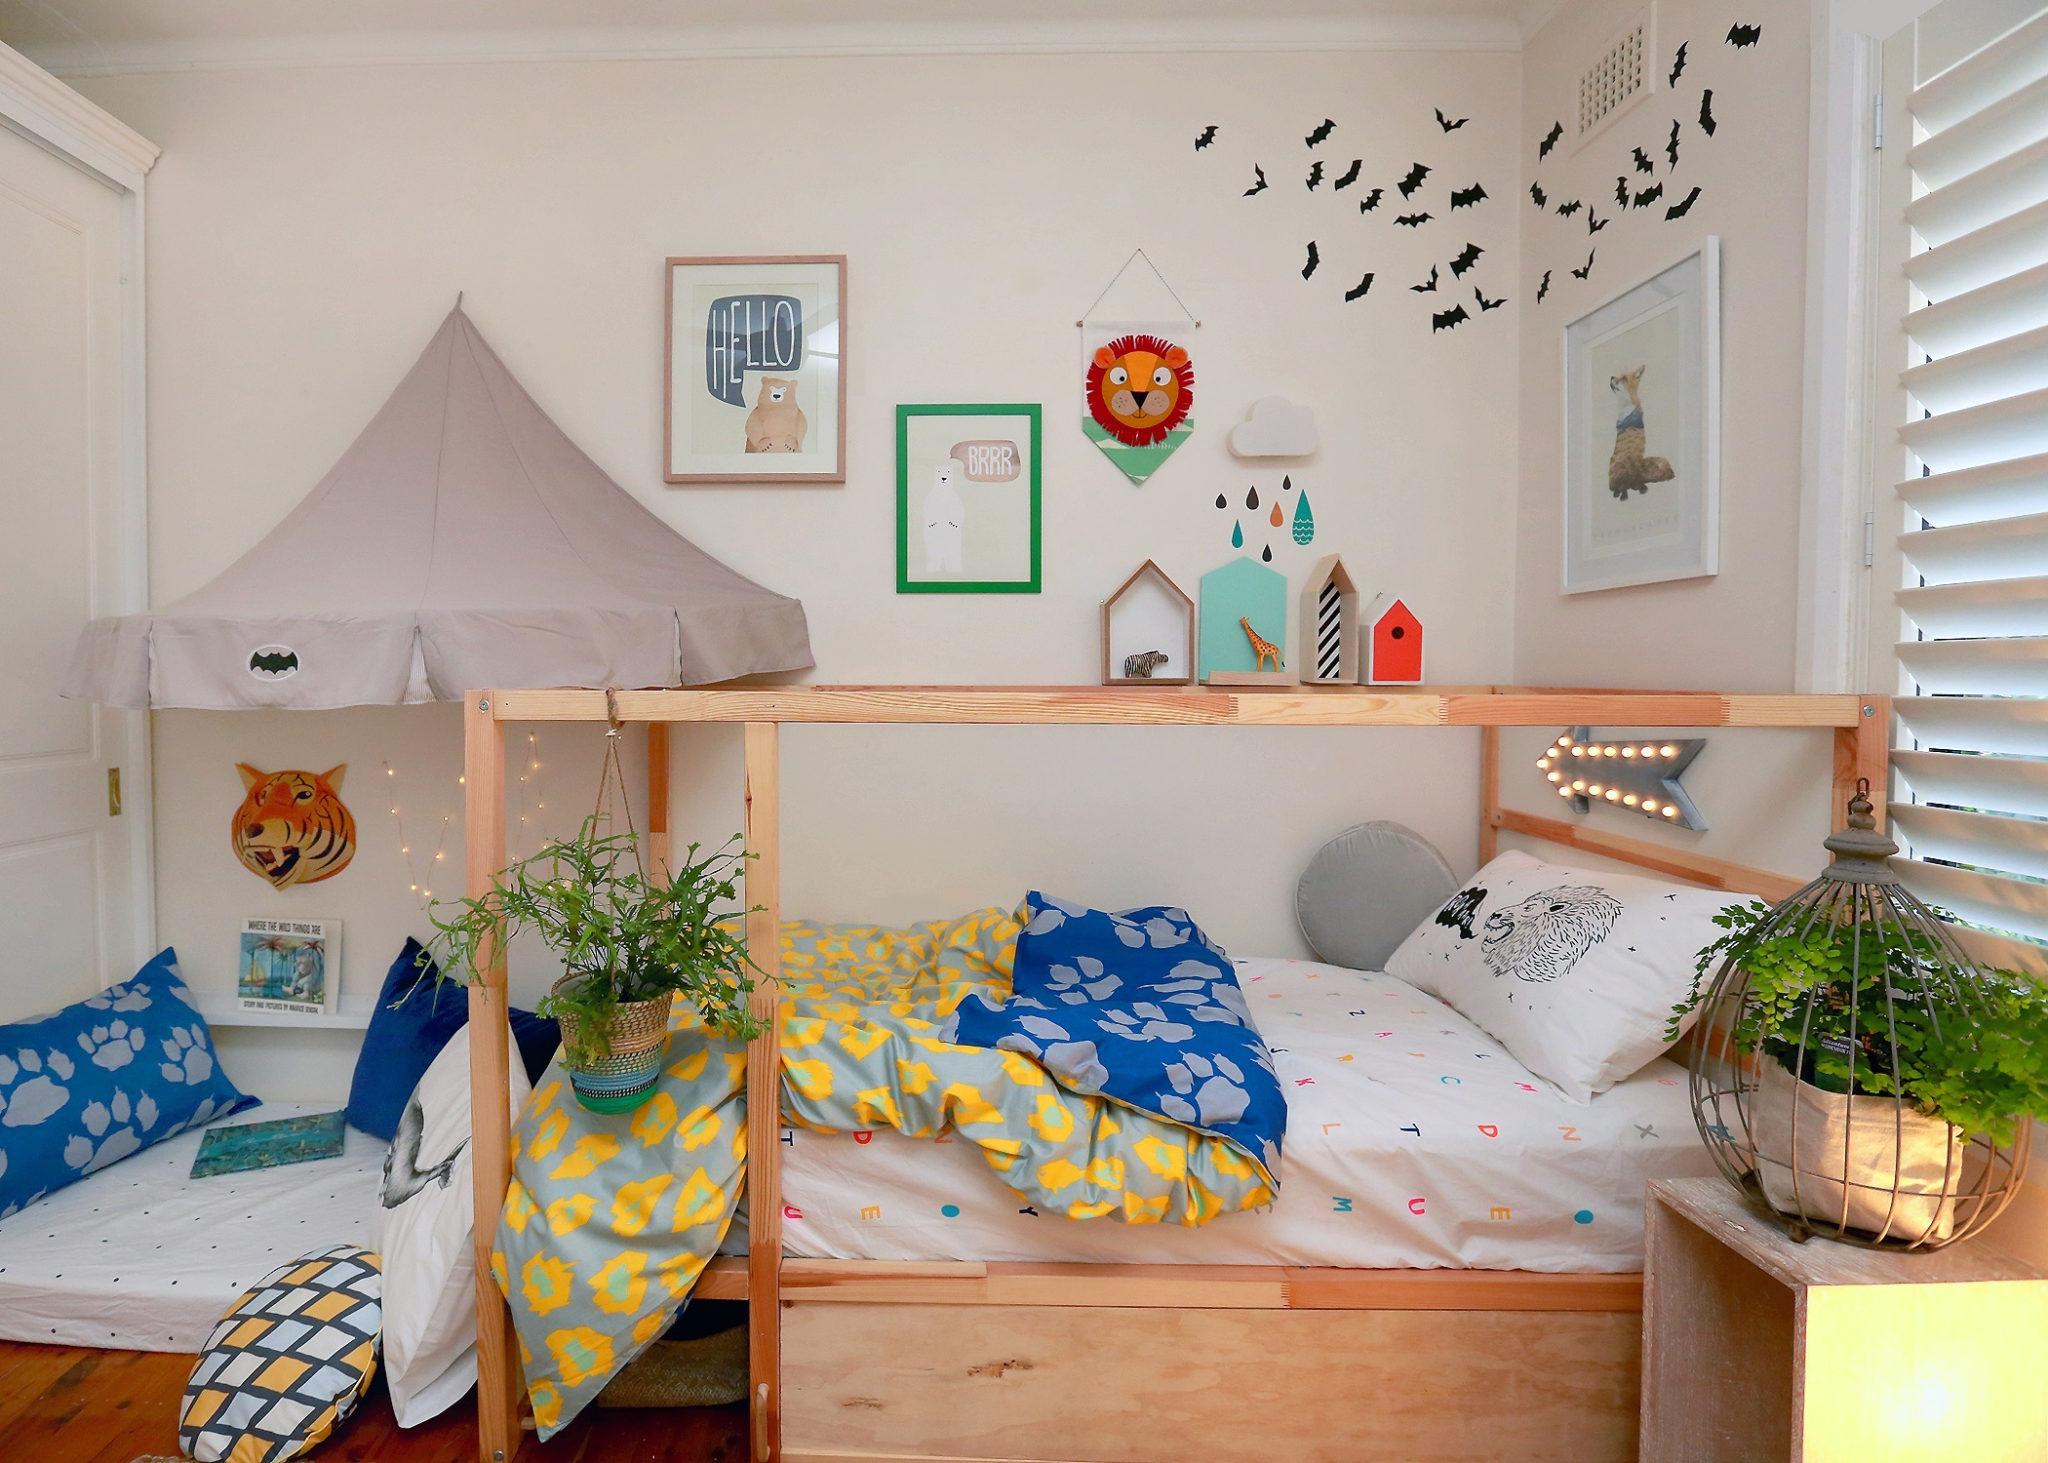 Boys jungle room, kids rooms inspiration